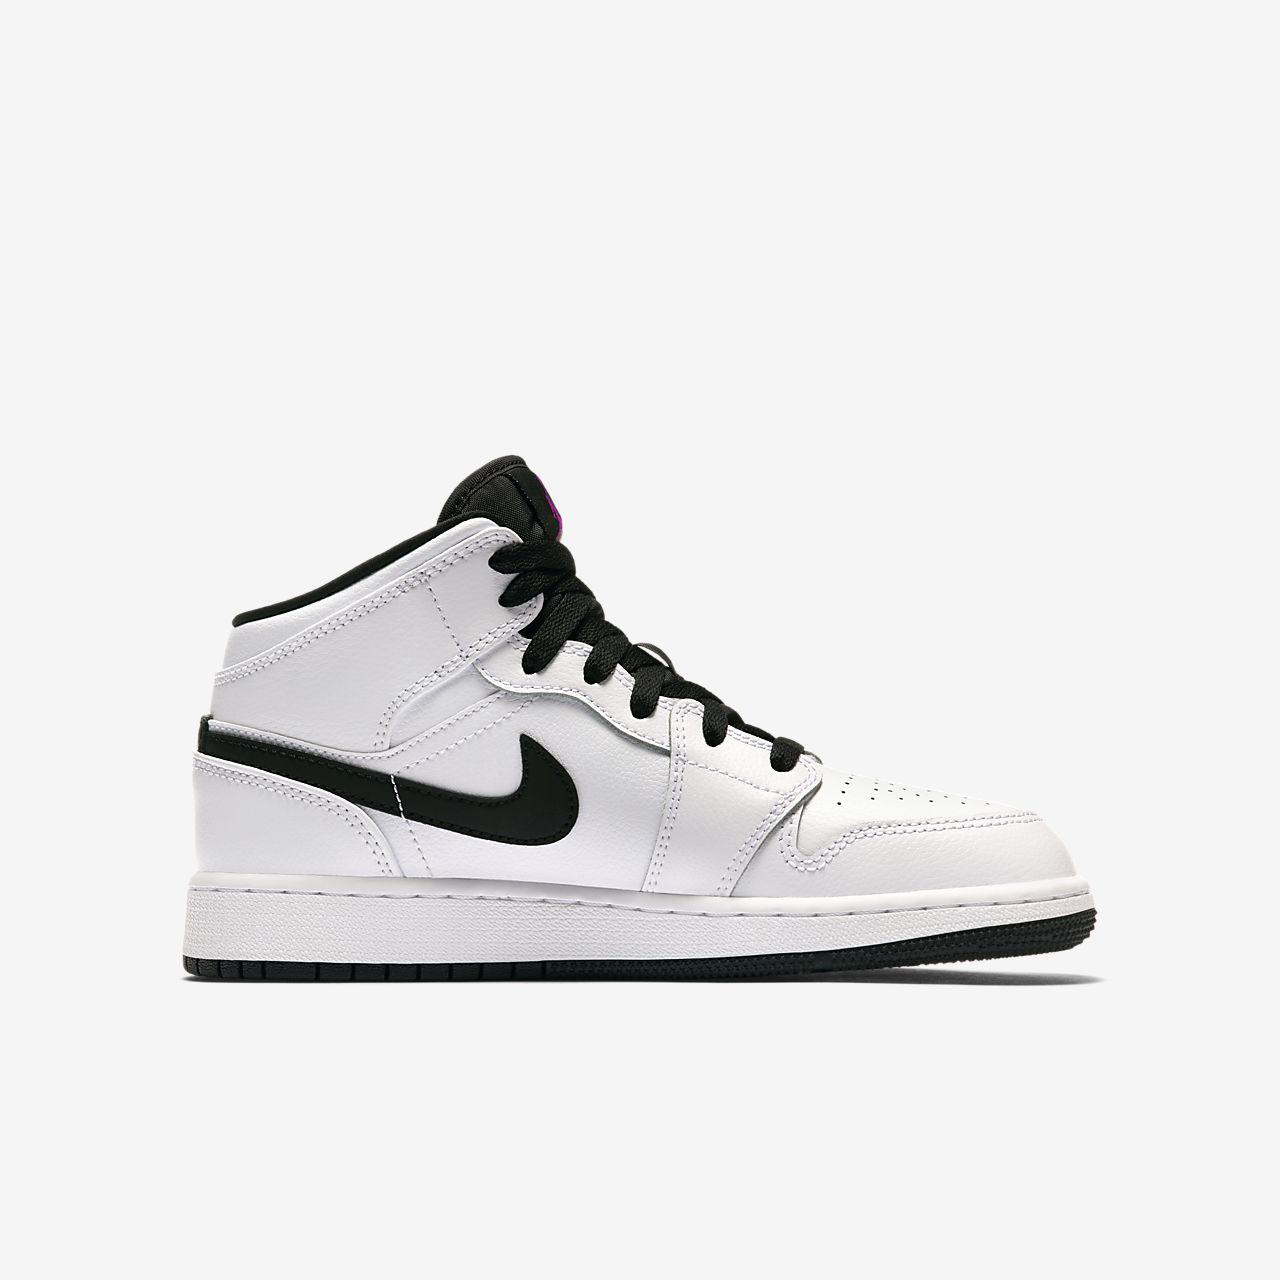 ... Air Jordan 1 Mid Older Kids' Shoe